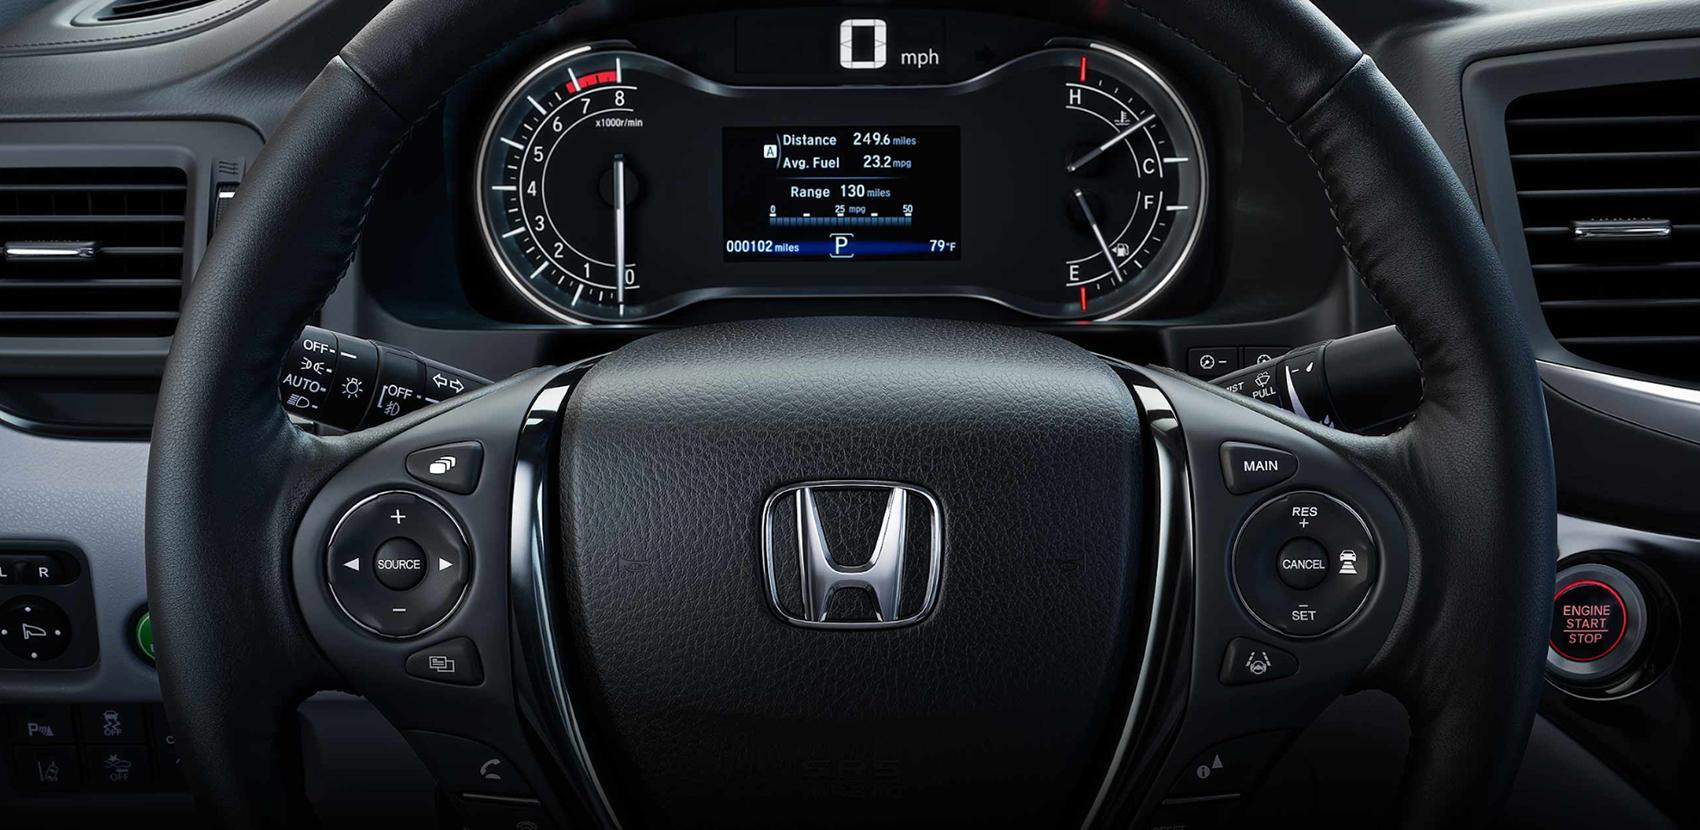 2019 Honda Ridgeline Dashboard Display